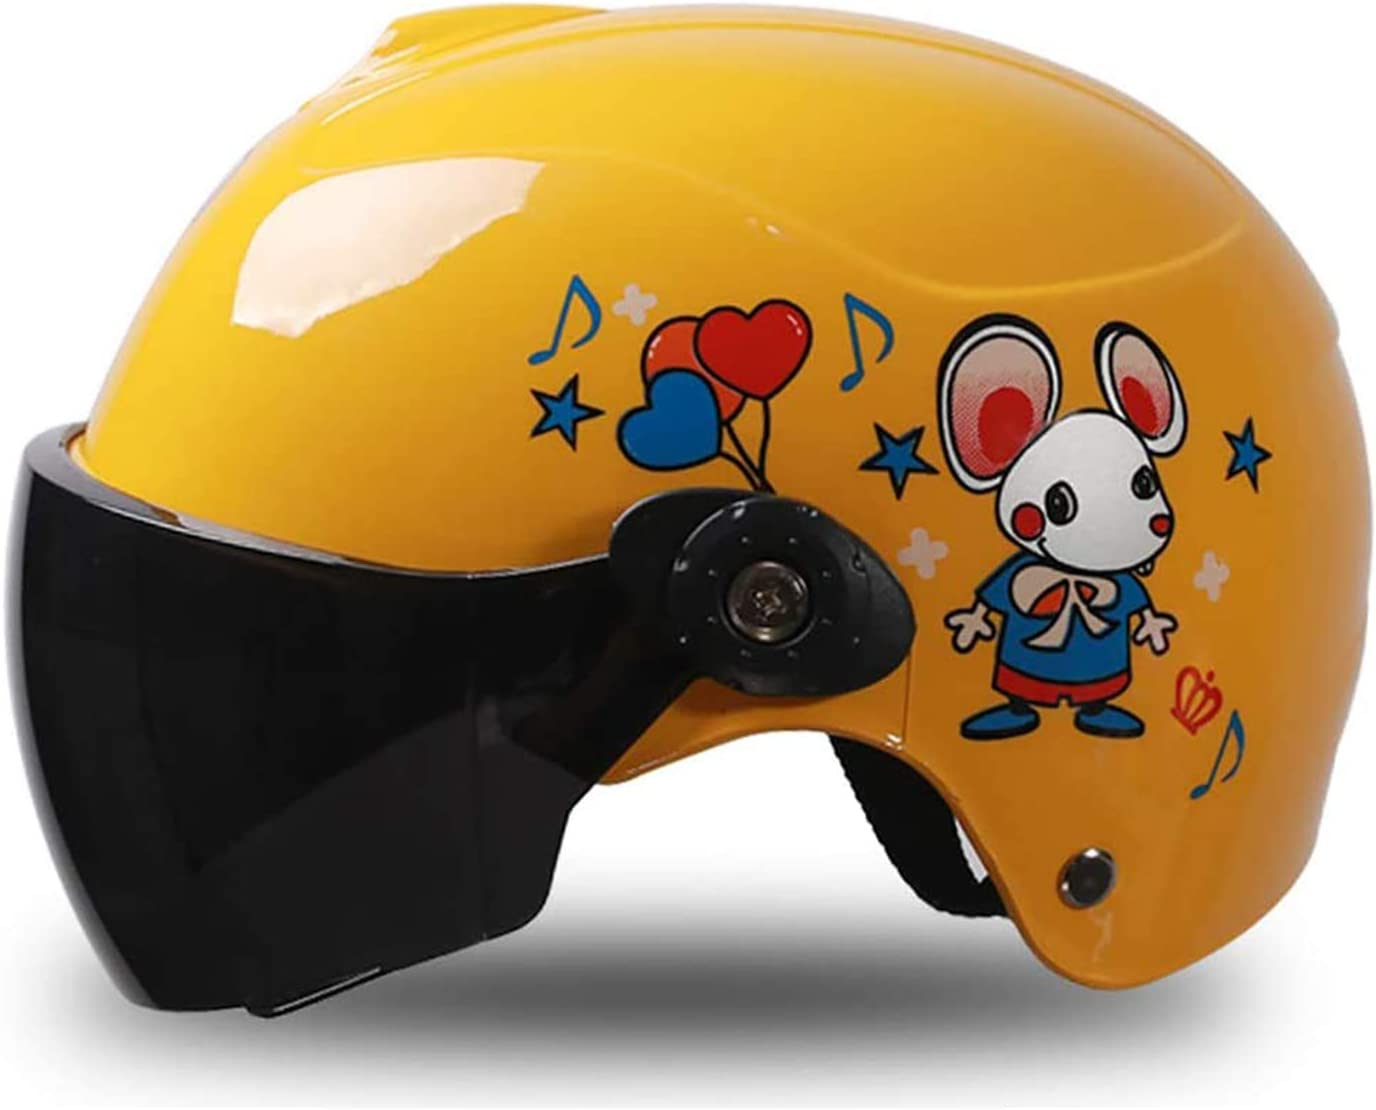 MHCYKJ Casco de Bicicletas para niños, Casco para niños pequeños, Ajustable Multiuso Jóvenes y niños Sports Sports Sports Security Safety Bicycle Roller Skating Scooter Casco